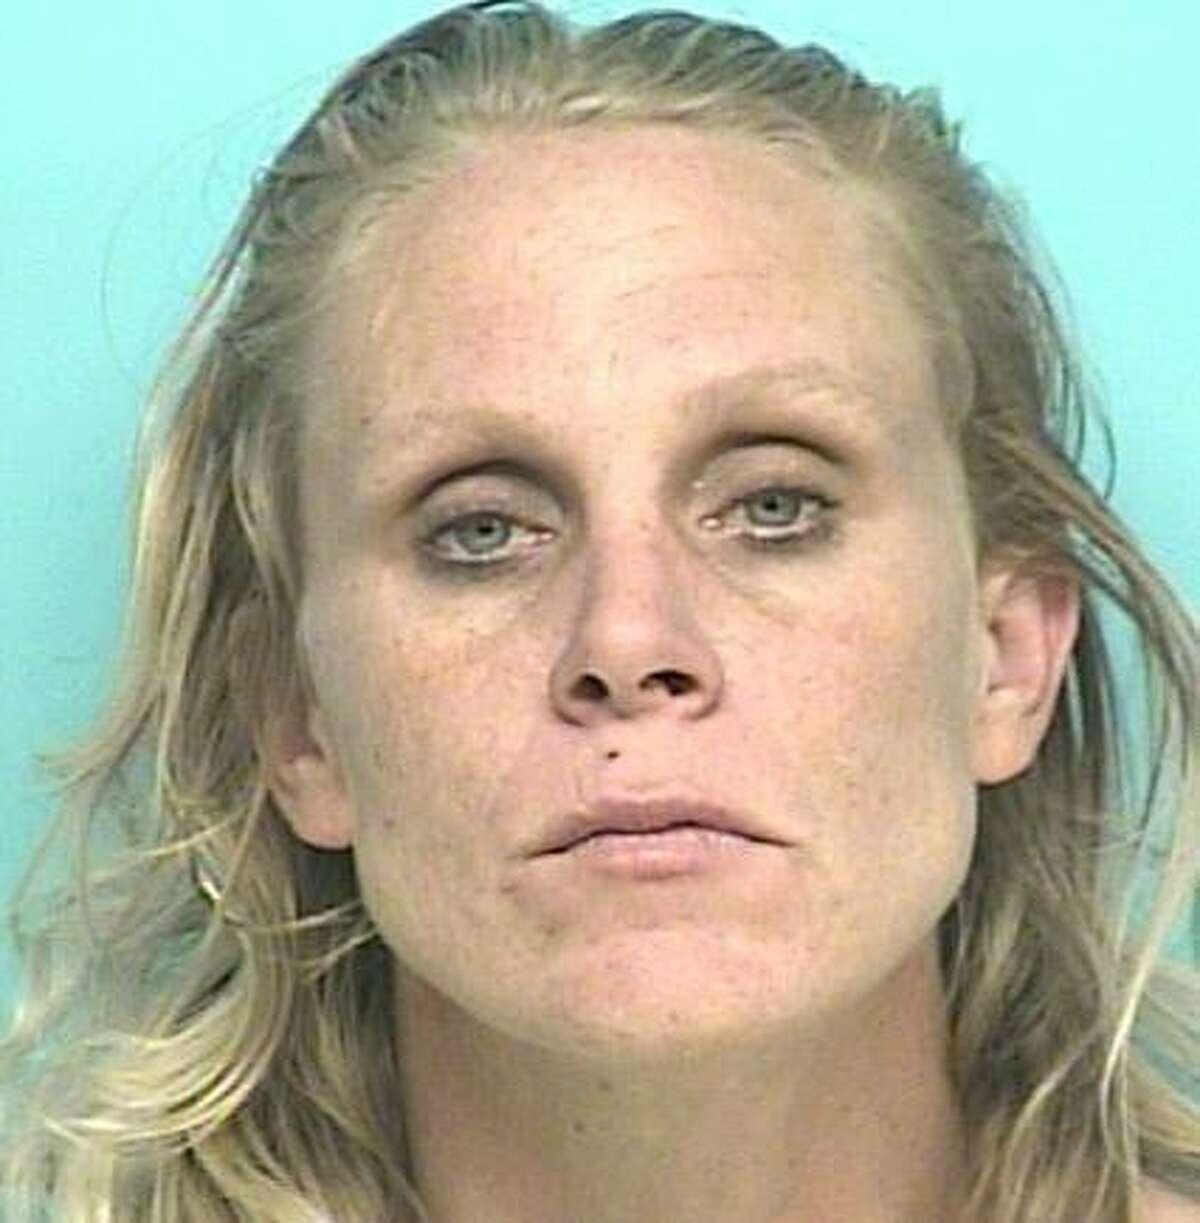 "CHANDLER, Tonya JoWhite/Female DOB: 01/23/1976Height: 5'08"" Weight: 150 lbs.Hair: Blonde Eyes: BlueWarrant: # 120302503 Capias Debit/Credit Card Abuse LKA: Hall., Montgomery."